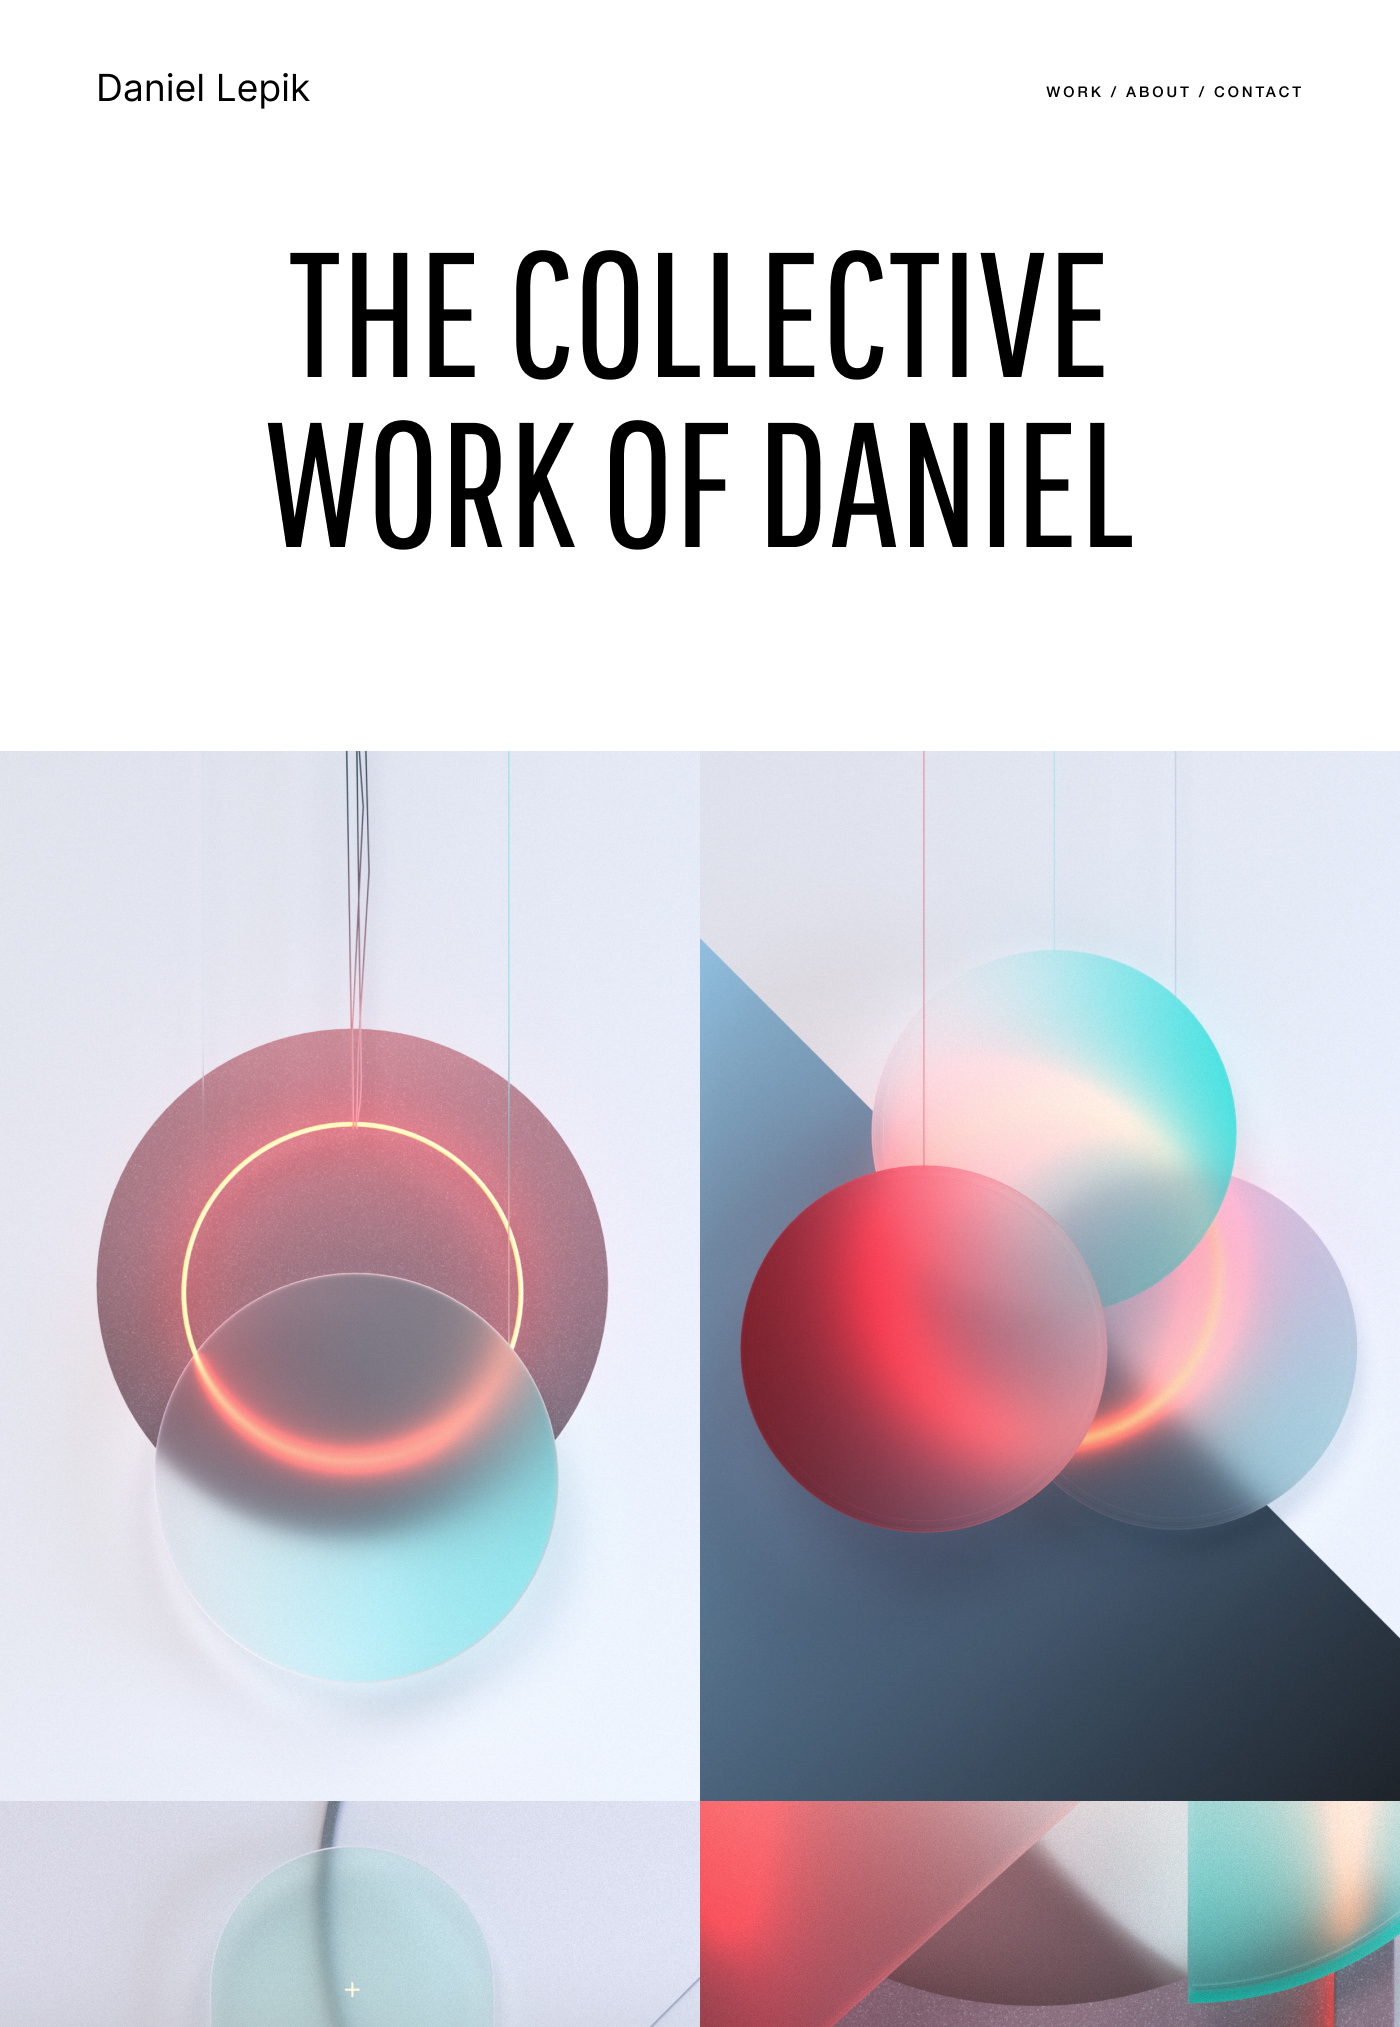 daniel-lepik-two-column-grid